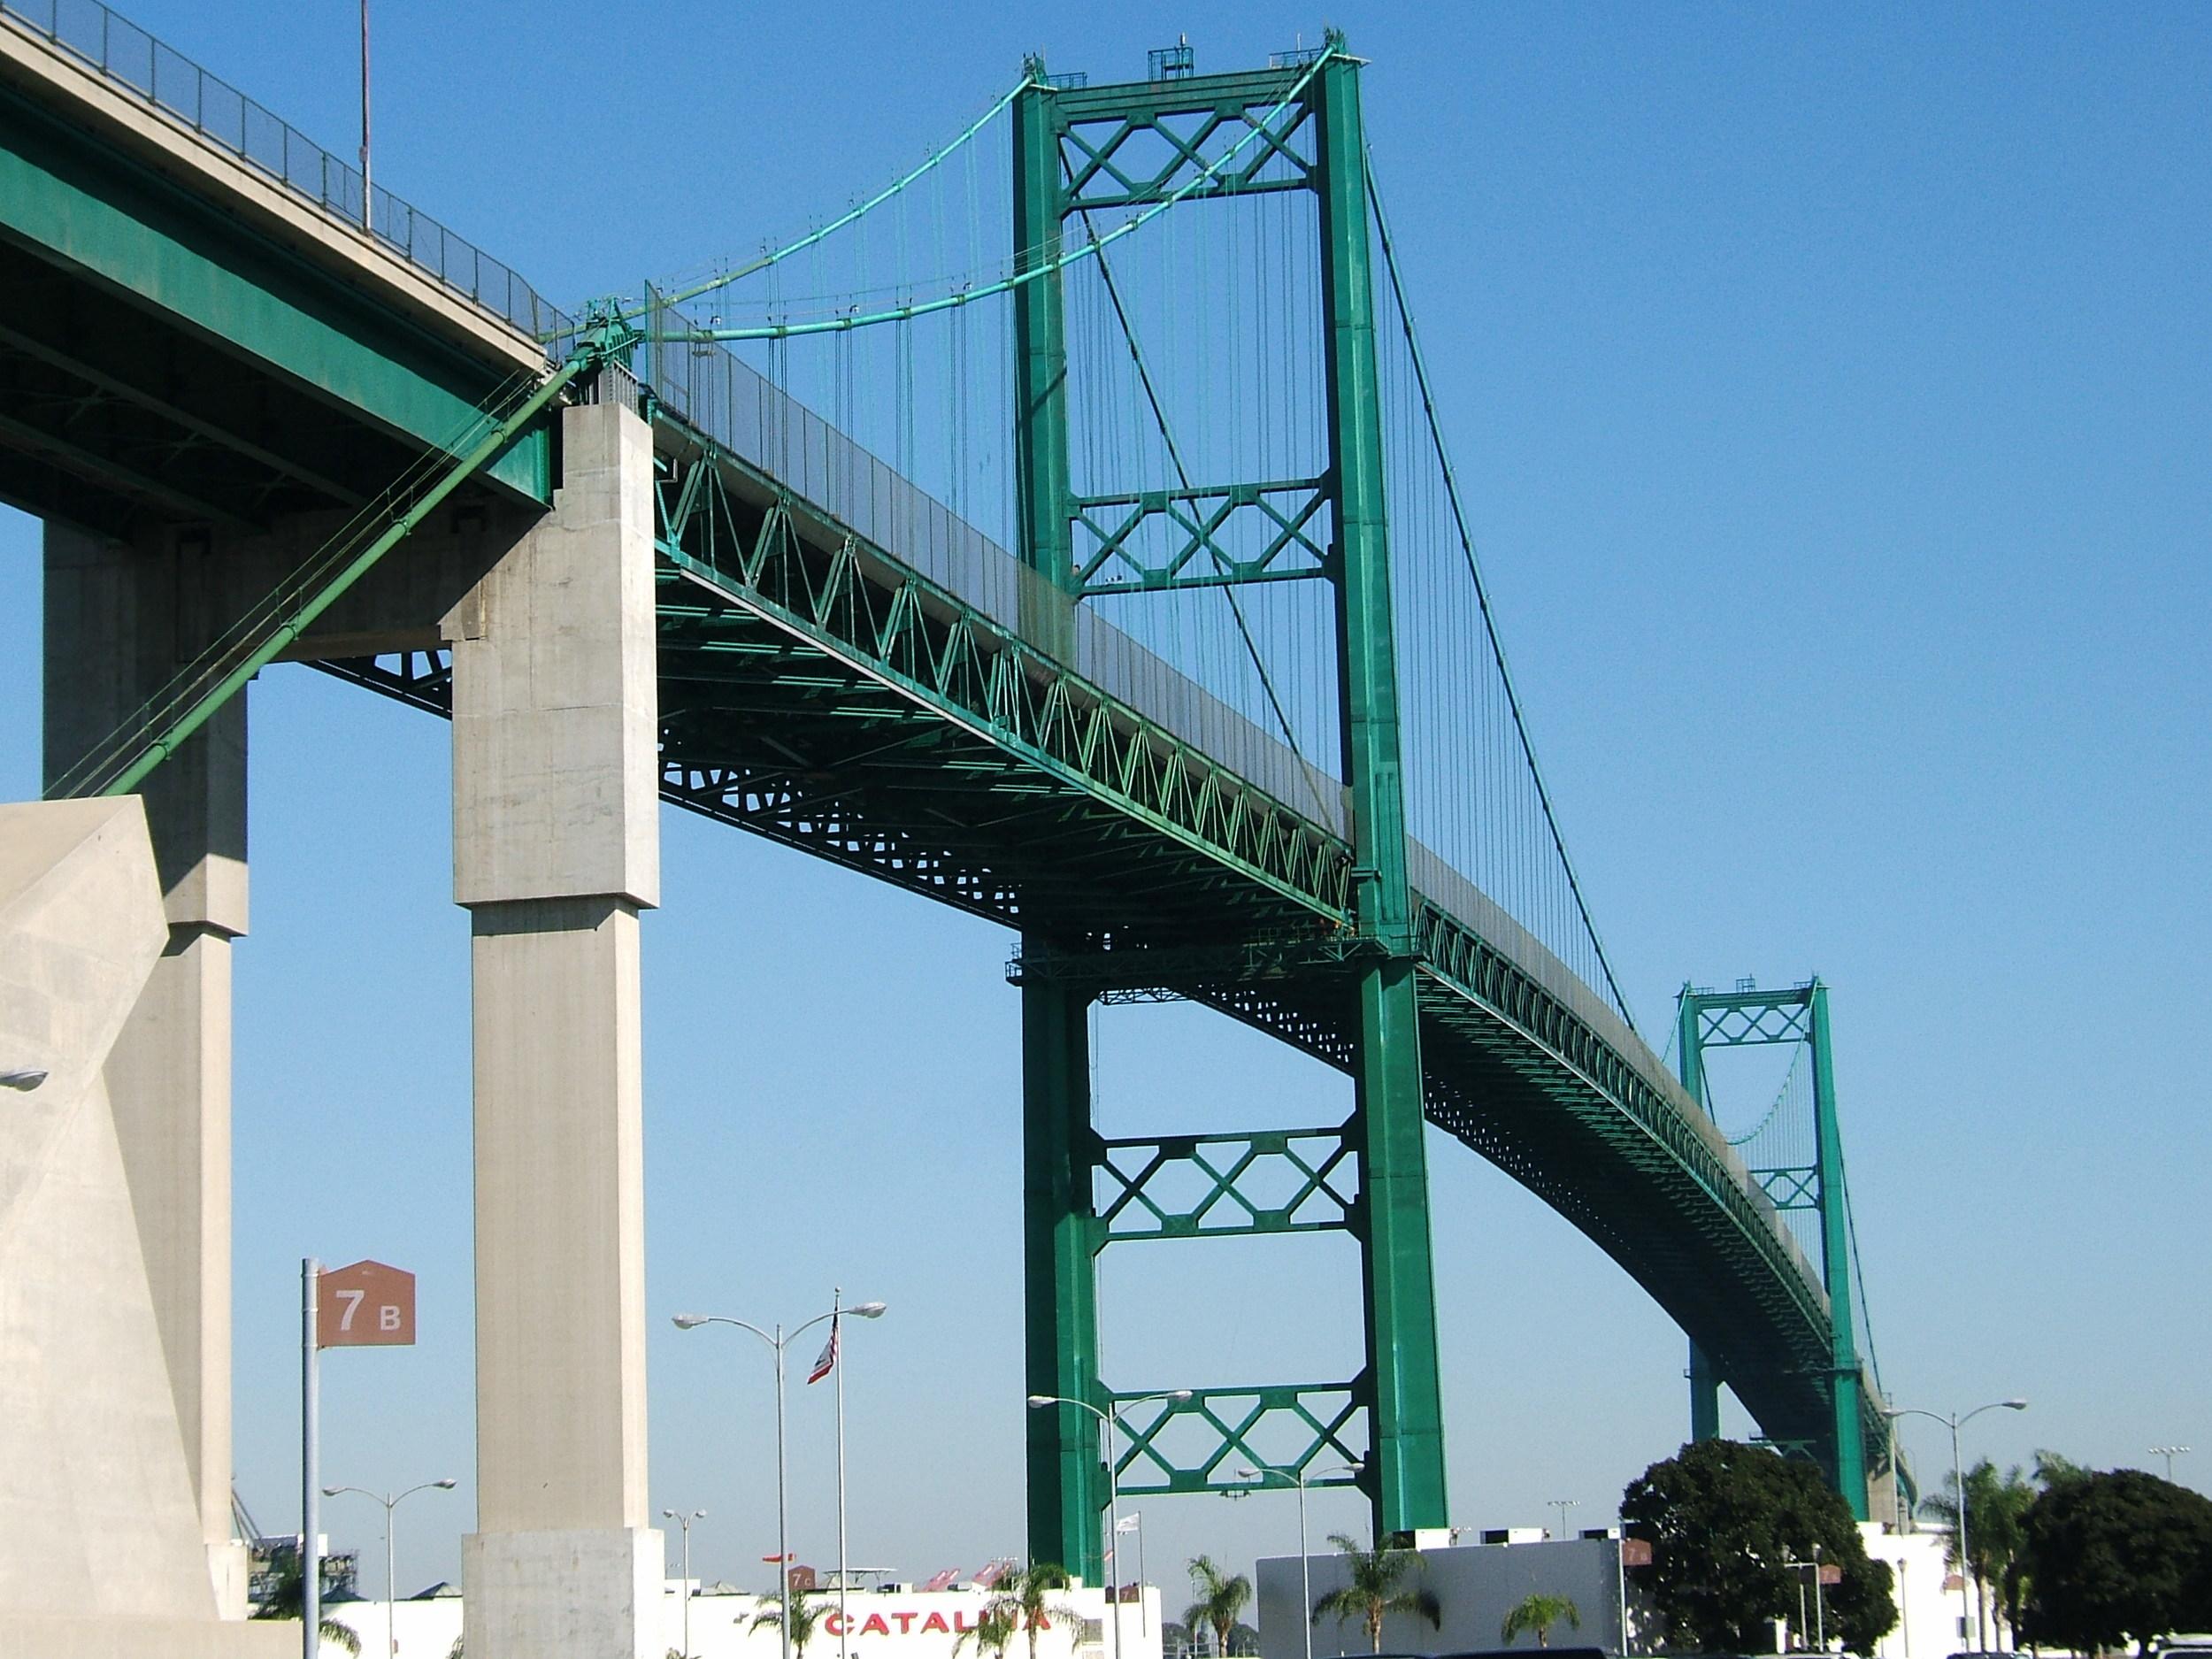 Vincent_Thomas_Bridge-2.jpg